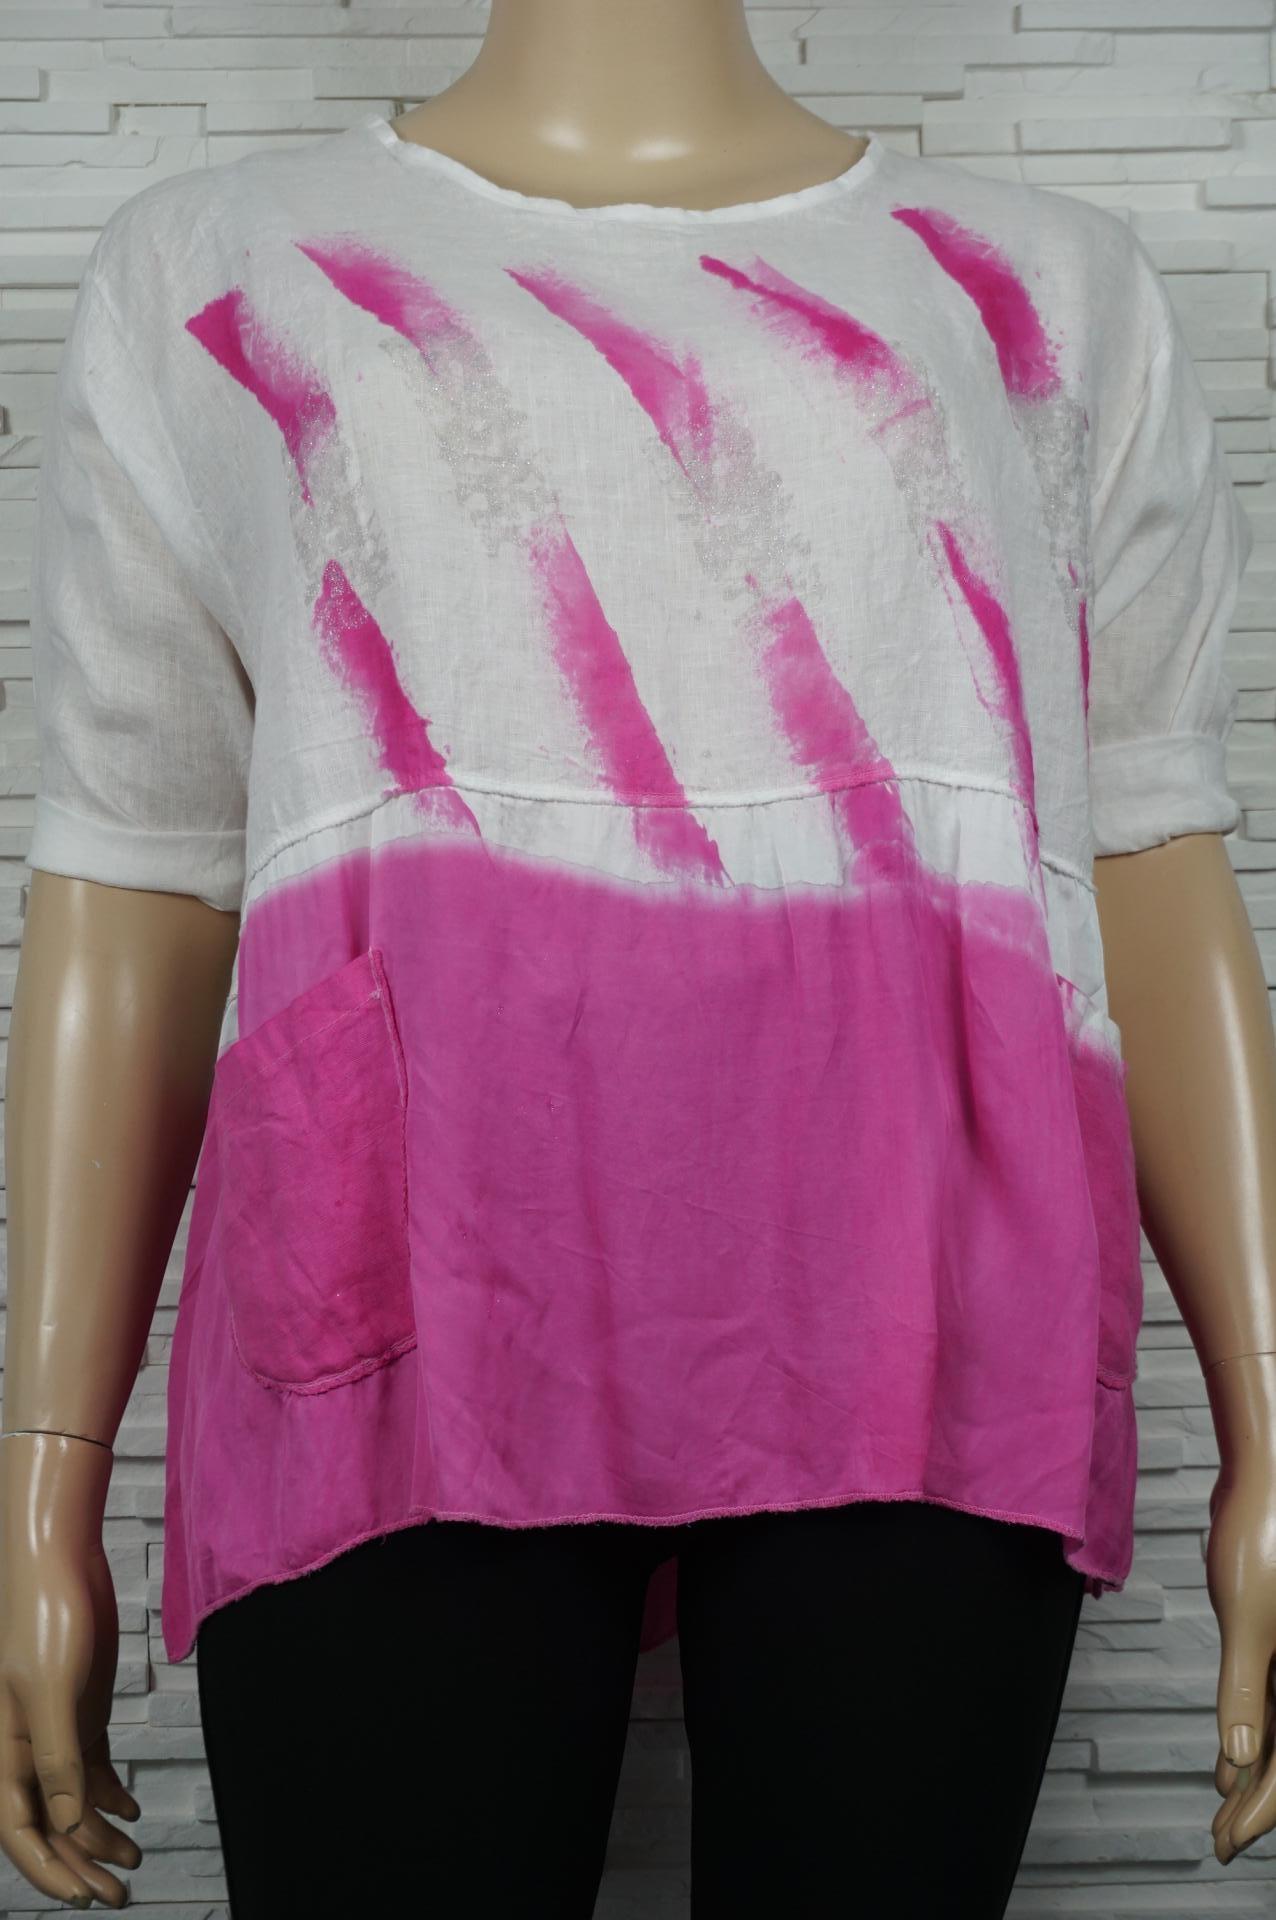 Blouse en  lin  tie and dye fuschia avec poches